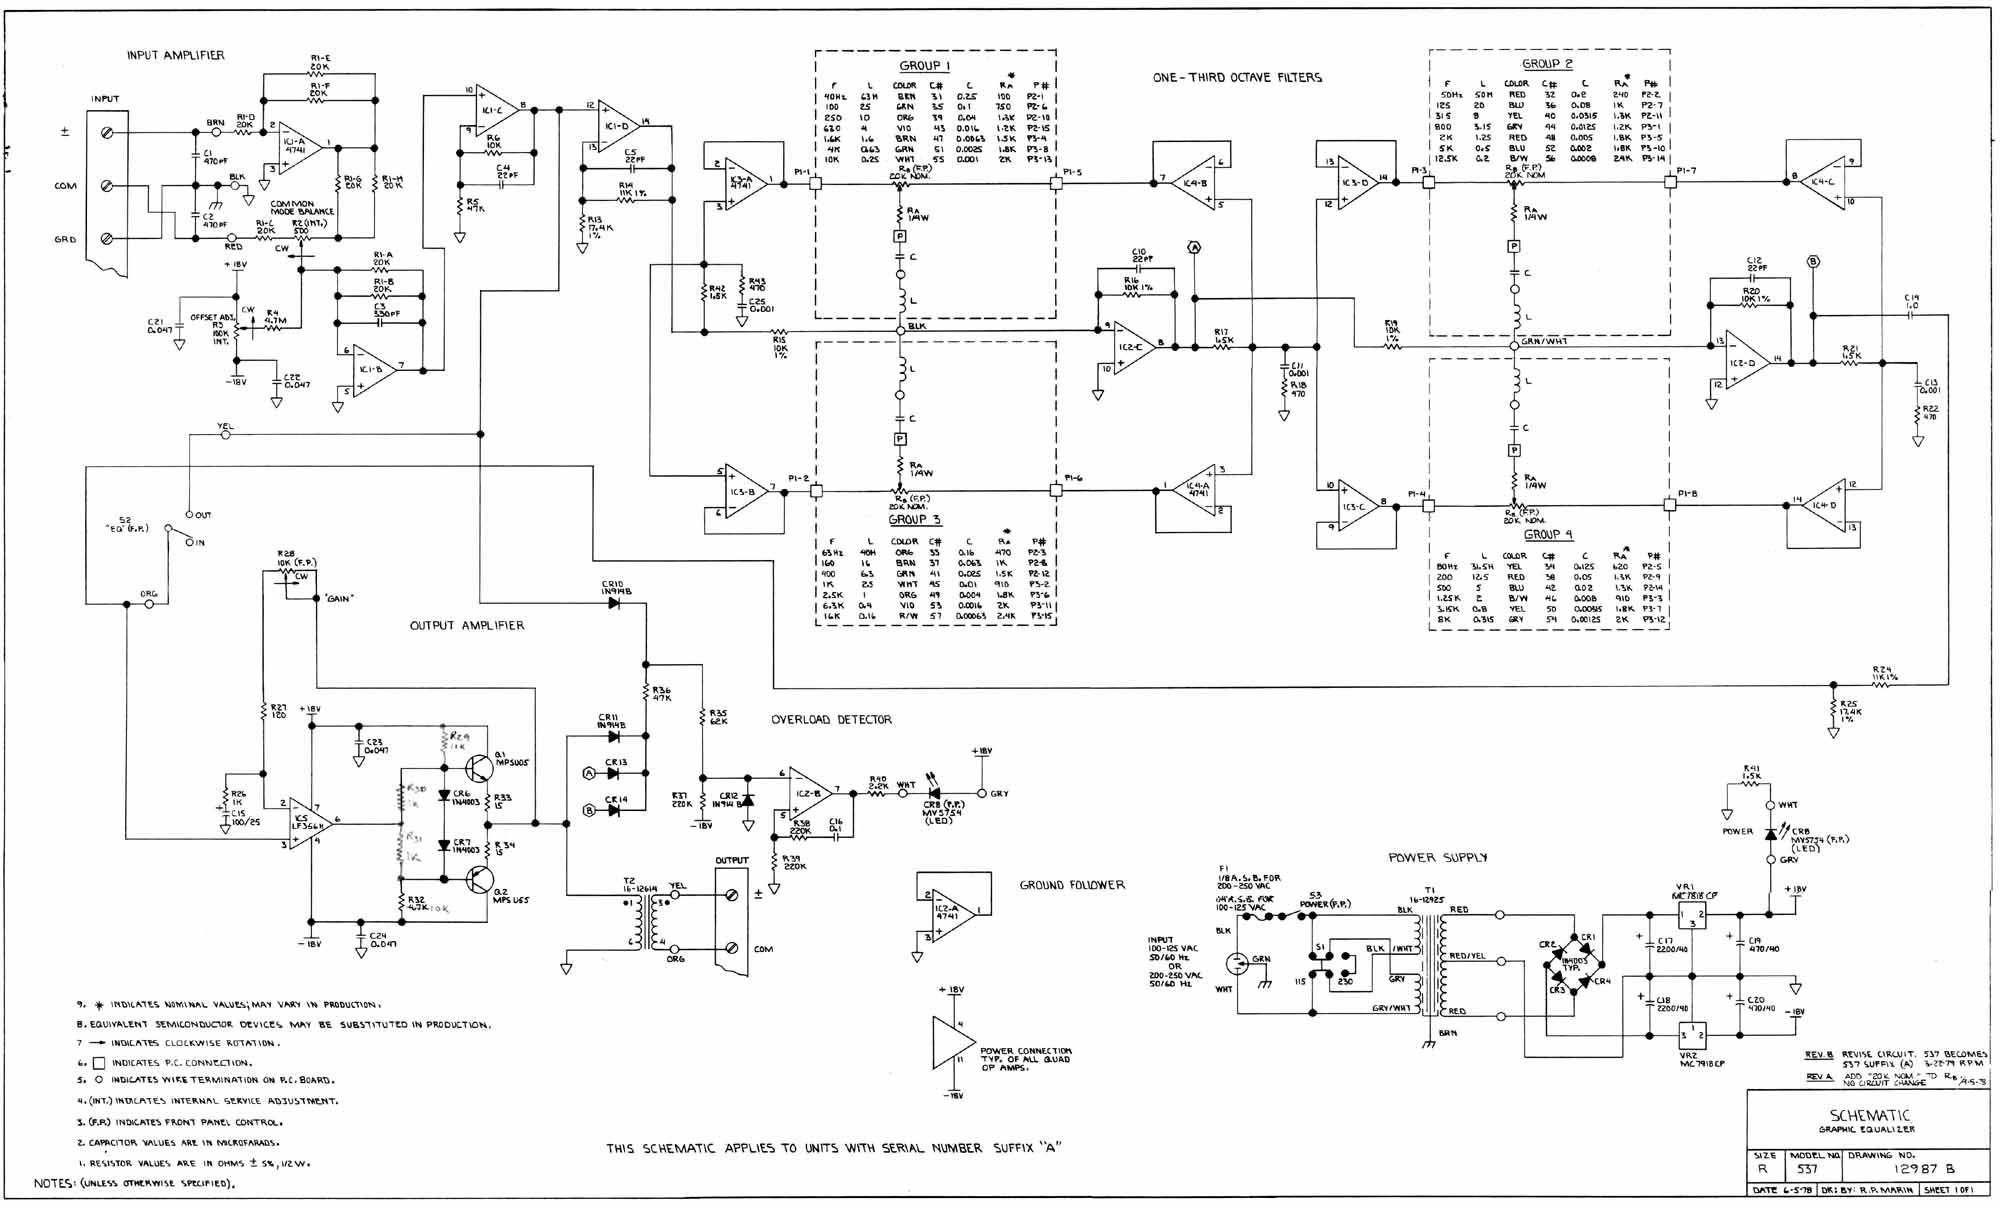 active crossover wiring diagram 1967 jeep cj5 urei 537 equalizer schematic